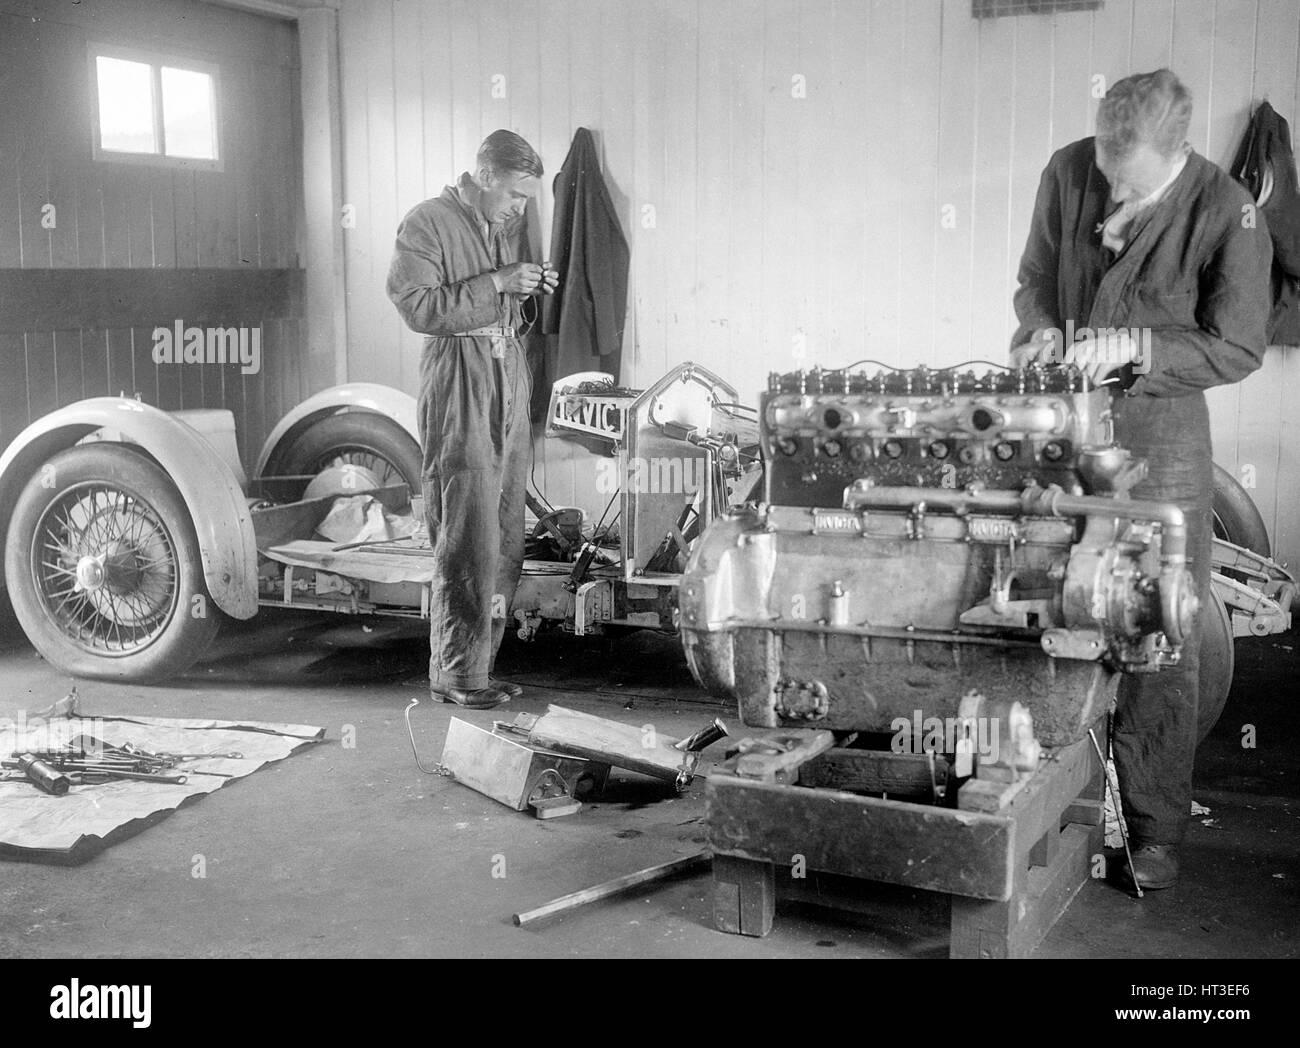 Mechanics working on Raymond Mays' 4500 cc Invicta car. Artist: Bill Brunell. - Stock Image